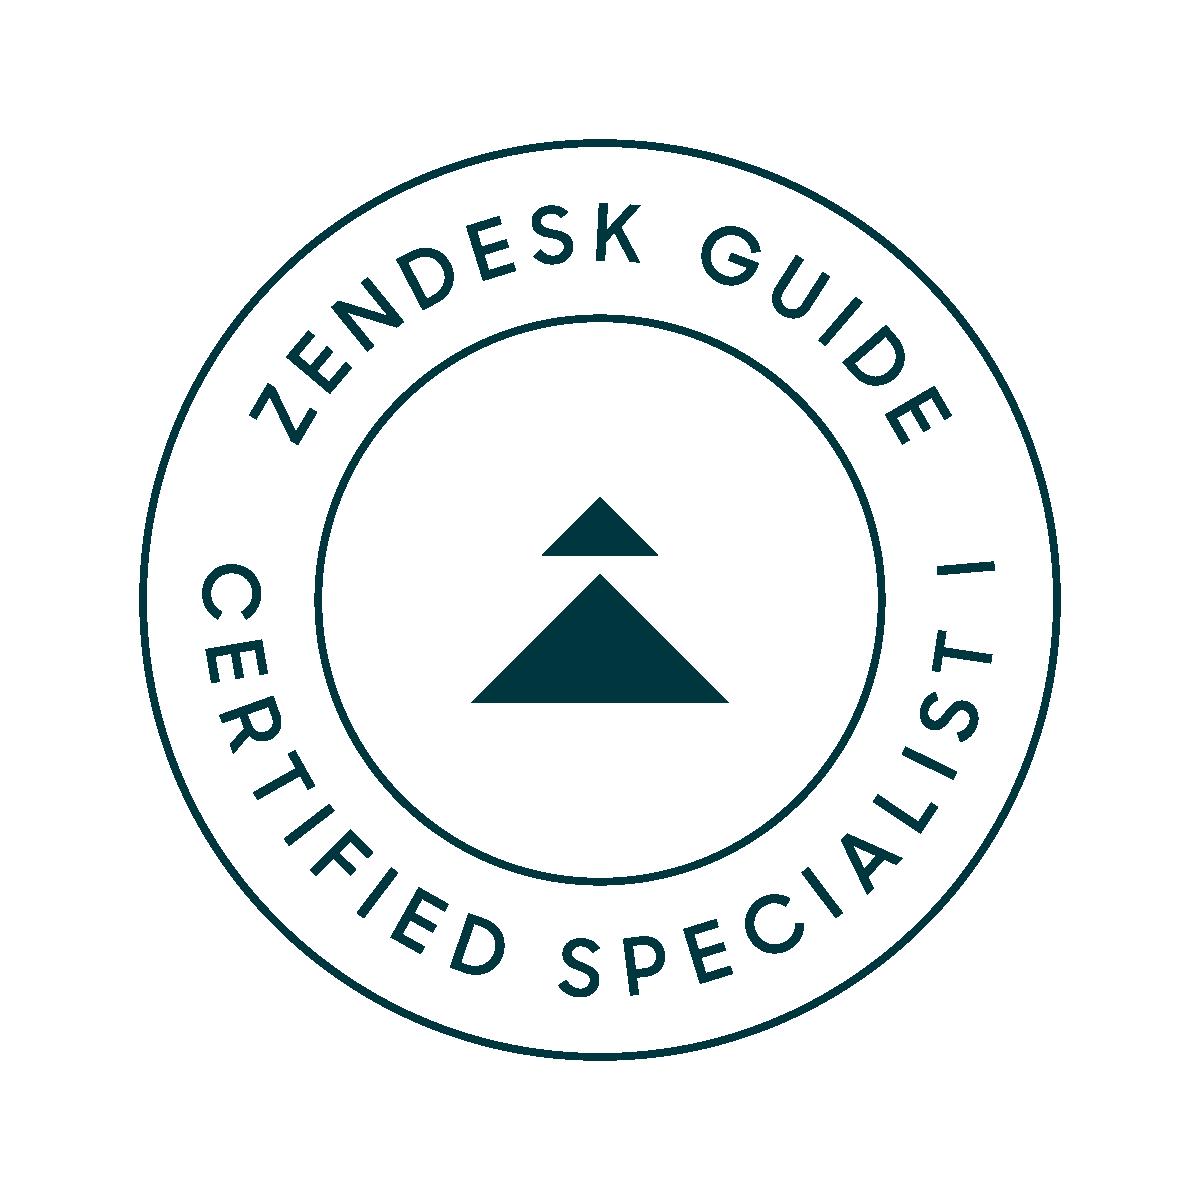 Zendesk Guide Specialist I